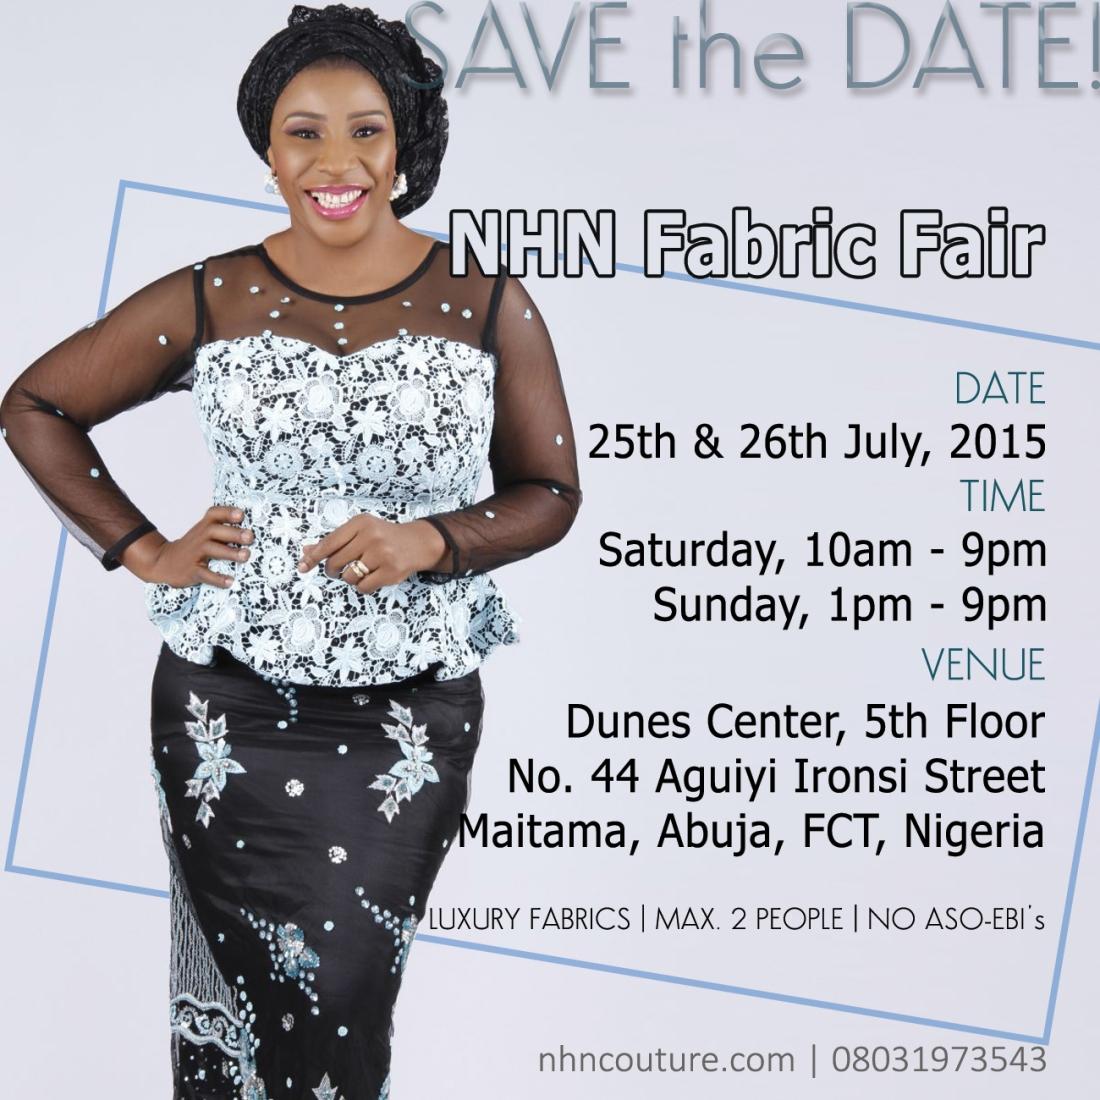 Save-the-Date-NHN-Fabric-Fair-Abuja-2015